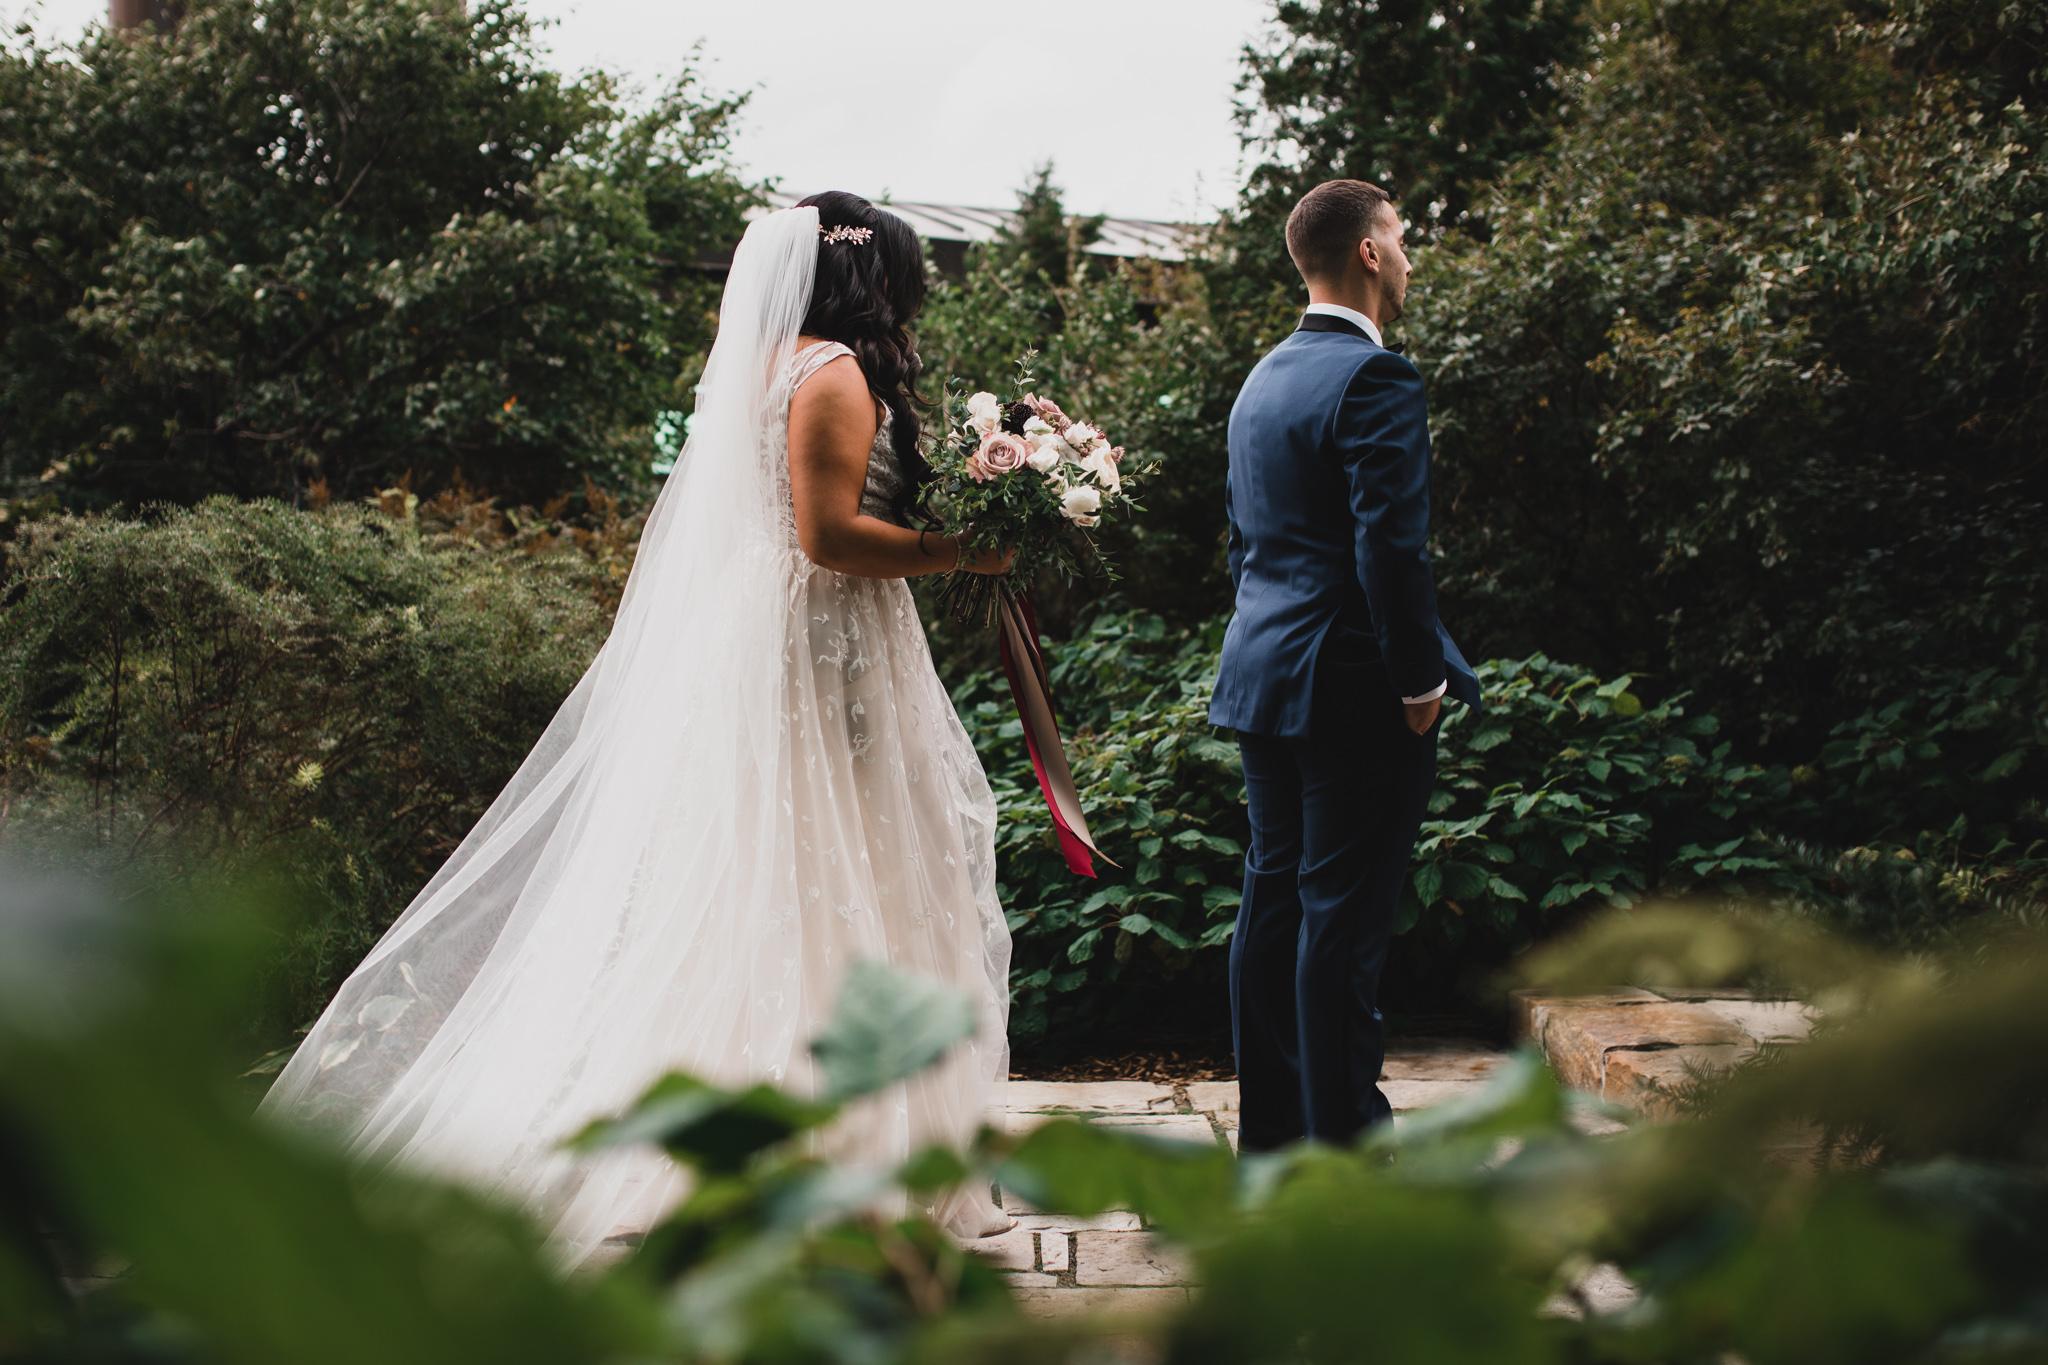 139-WEB-Jonathan-Kuhn-Photography-Alexa-Ahmed-Wedding-7436.jpg